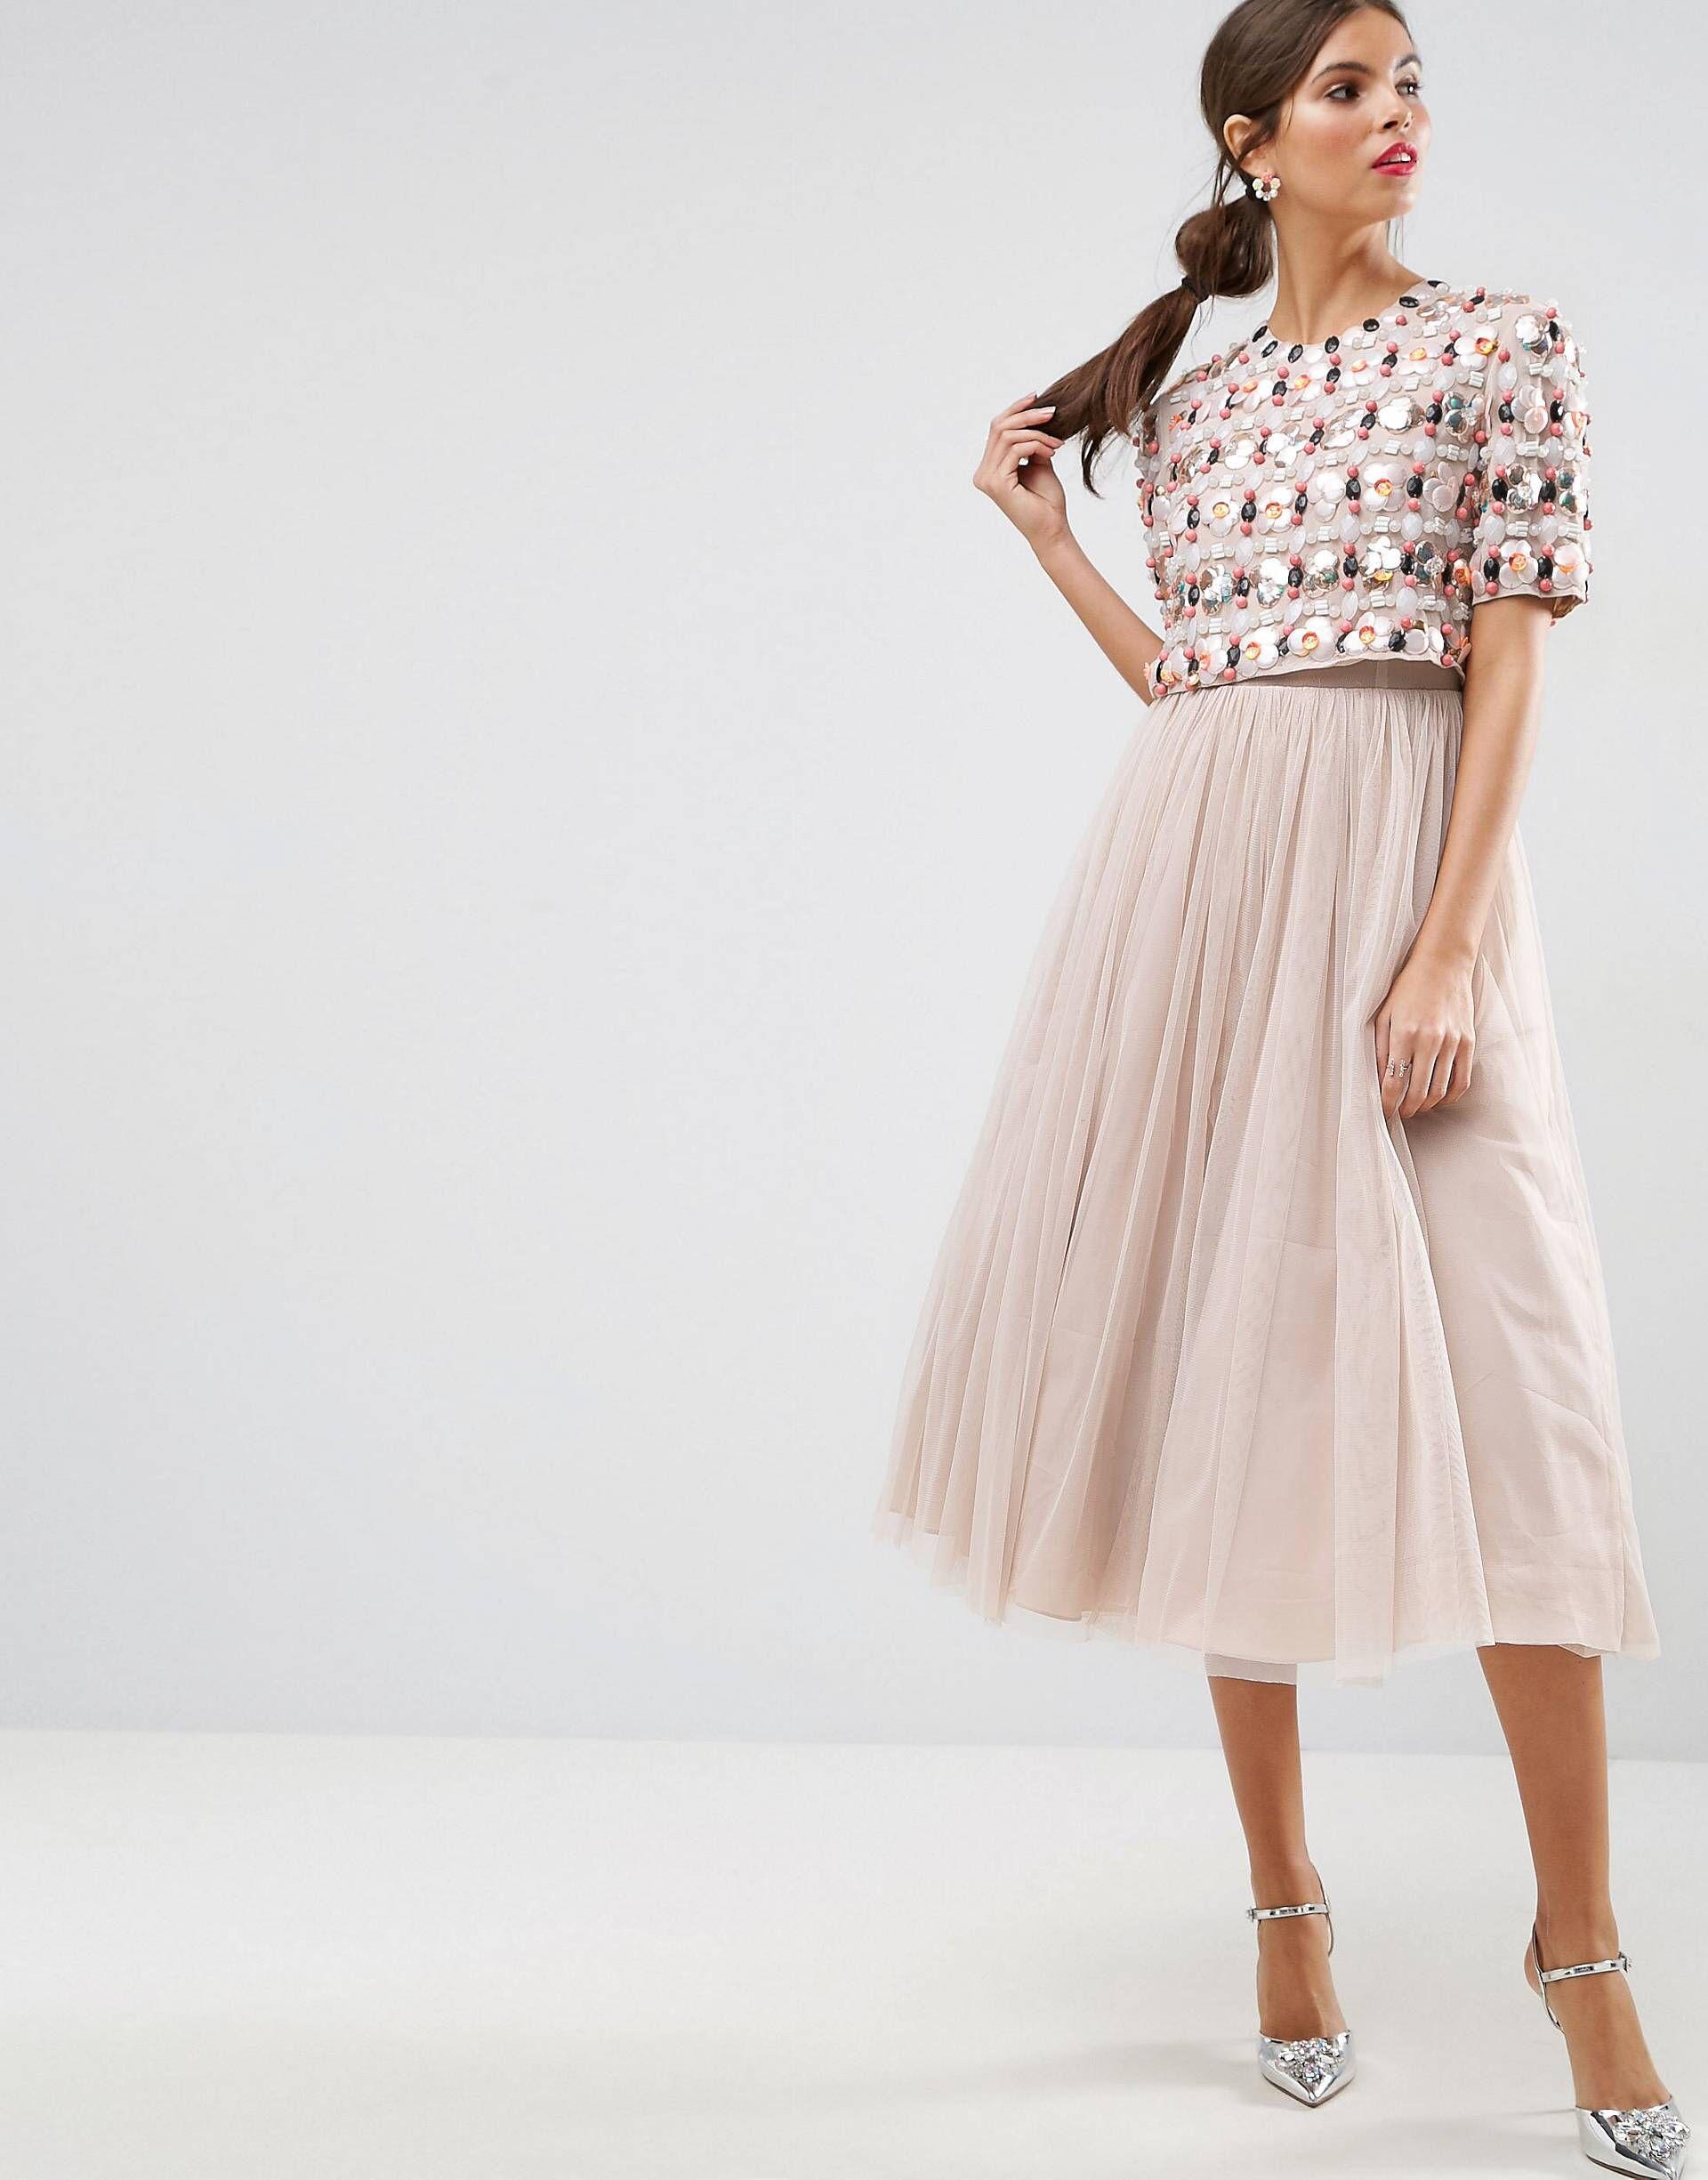 6b0d1ce09a026 Asos Embellished 3d Floral Crop Top Midi Dress